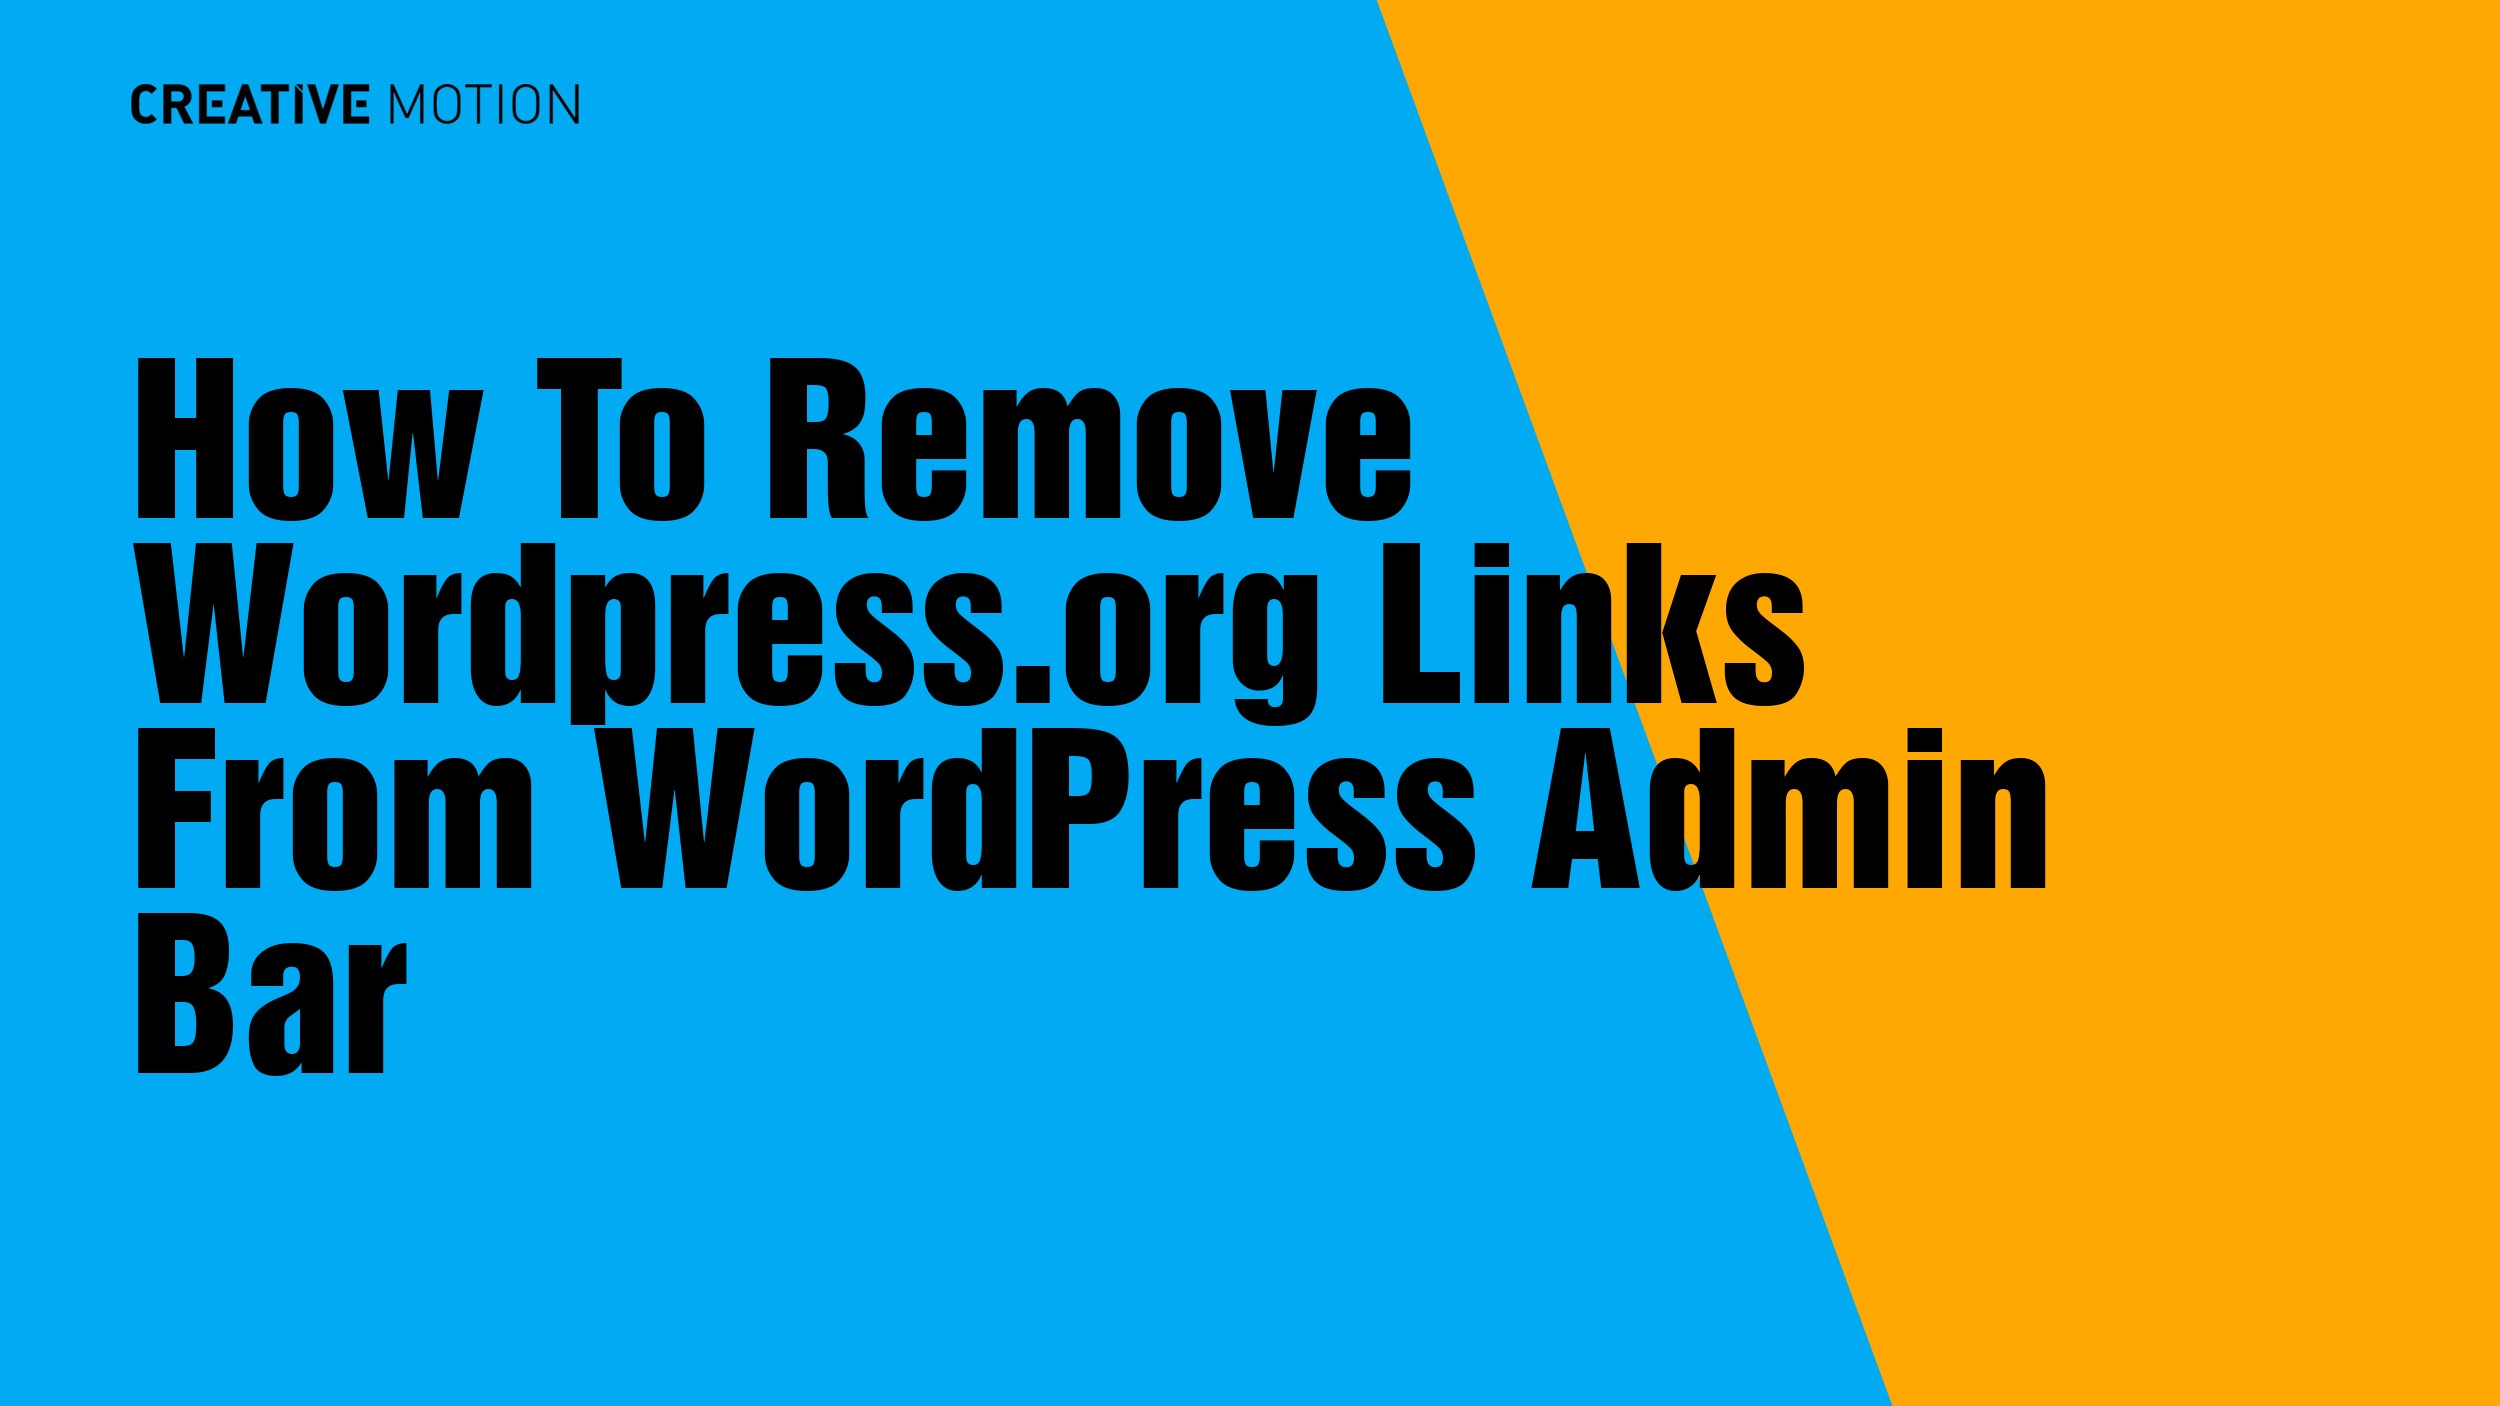 How To Remove WordPress.org Links From WordPress Admin Bar